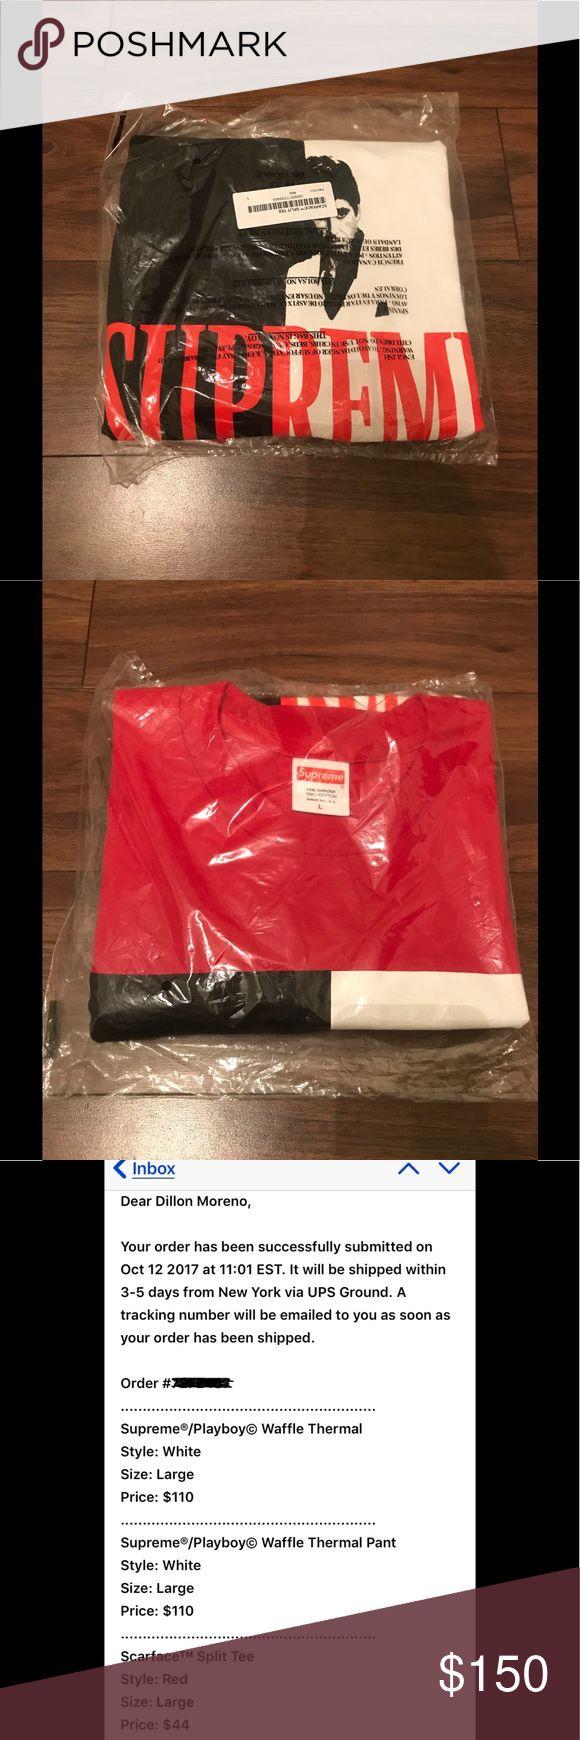 Supreme x Scarface Split Tee Brand New Supreme x Scarface Split Tee in Size Large! Never Opened the Bag! DeadStock AF! Fall/Winter 2017, Week 8 Release. Supreme Shirts